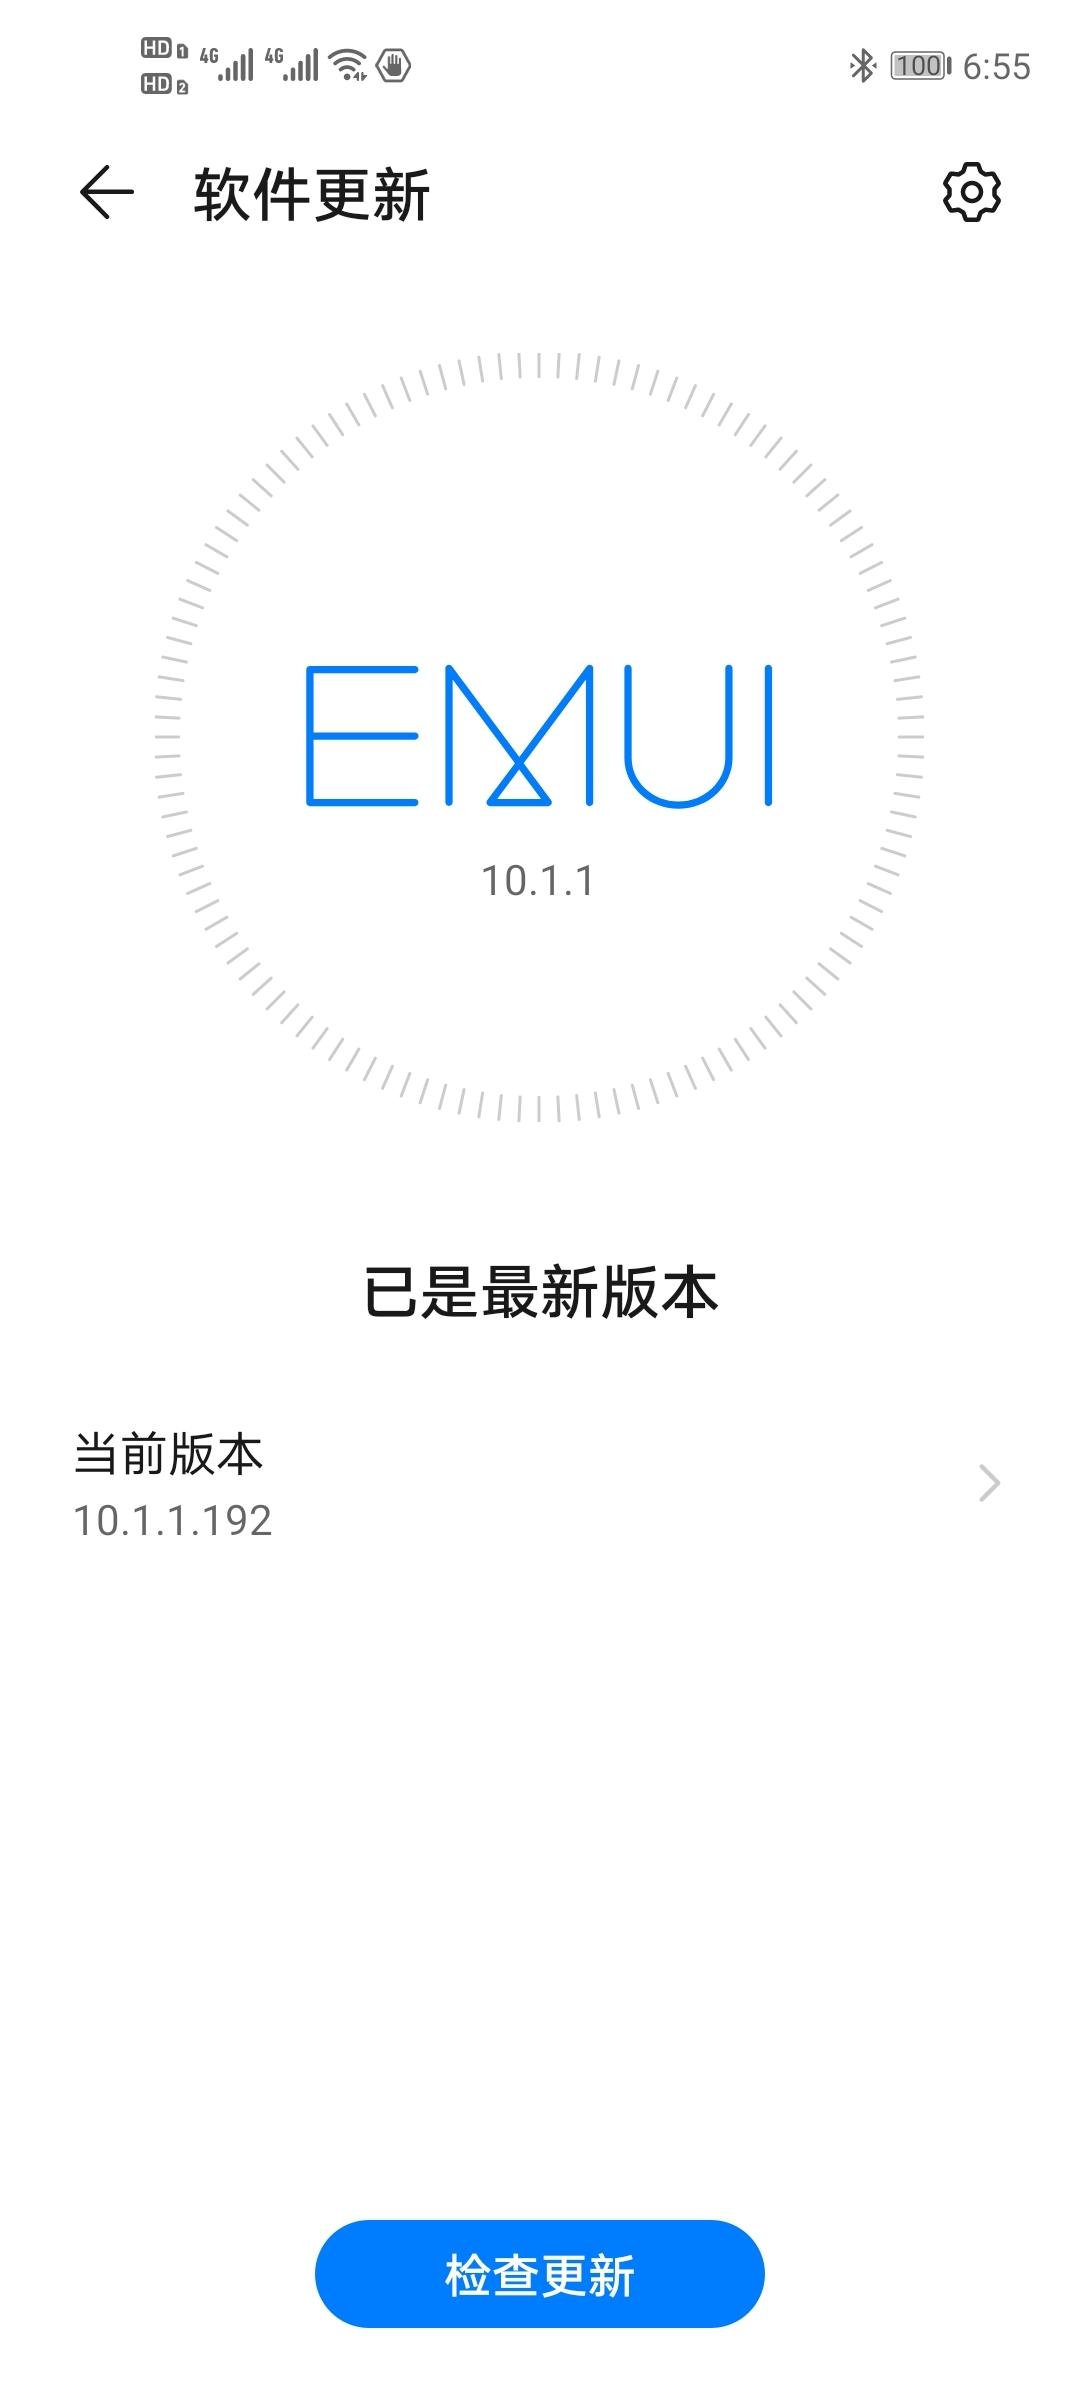 Screenshot_20210708_065504_com.huawei.android.hwouc.jpg